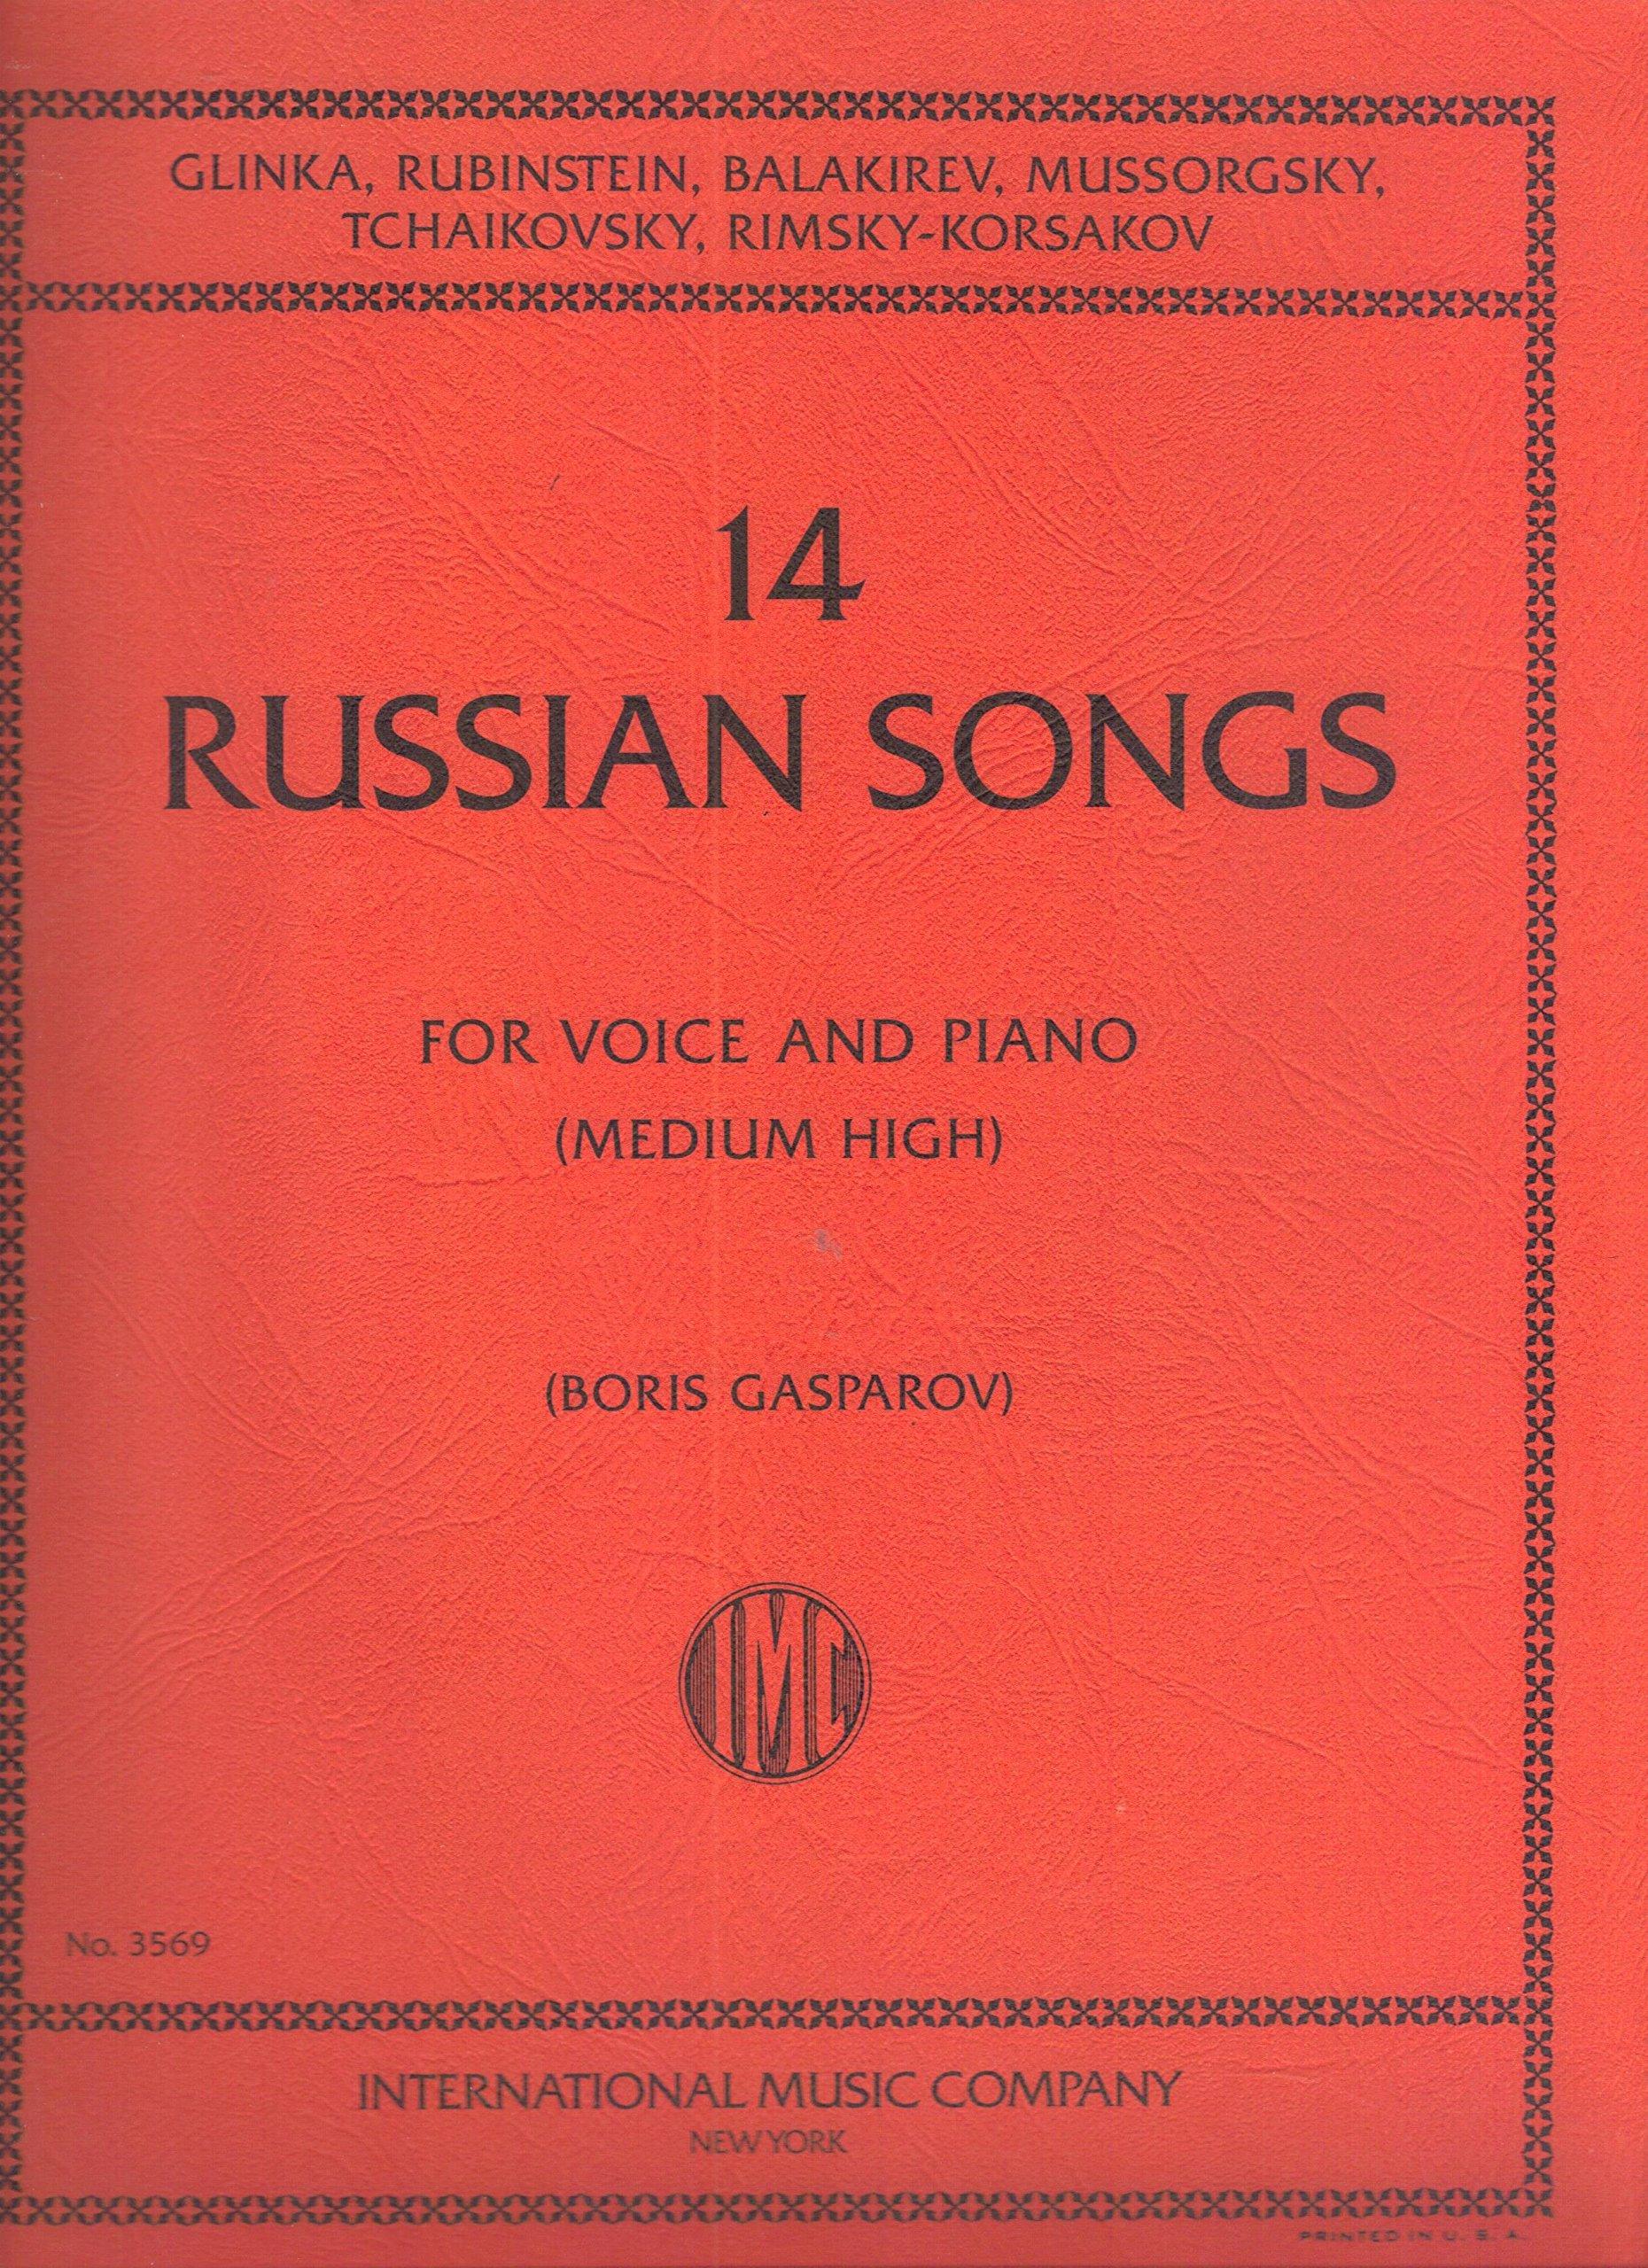 14 RUSSIAN SONGS, medium high voice & piano, Gasparov 3569 PDF